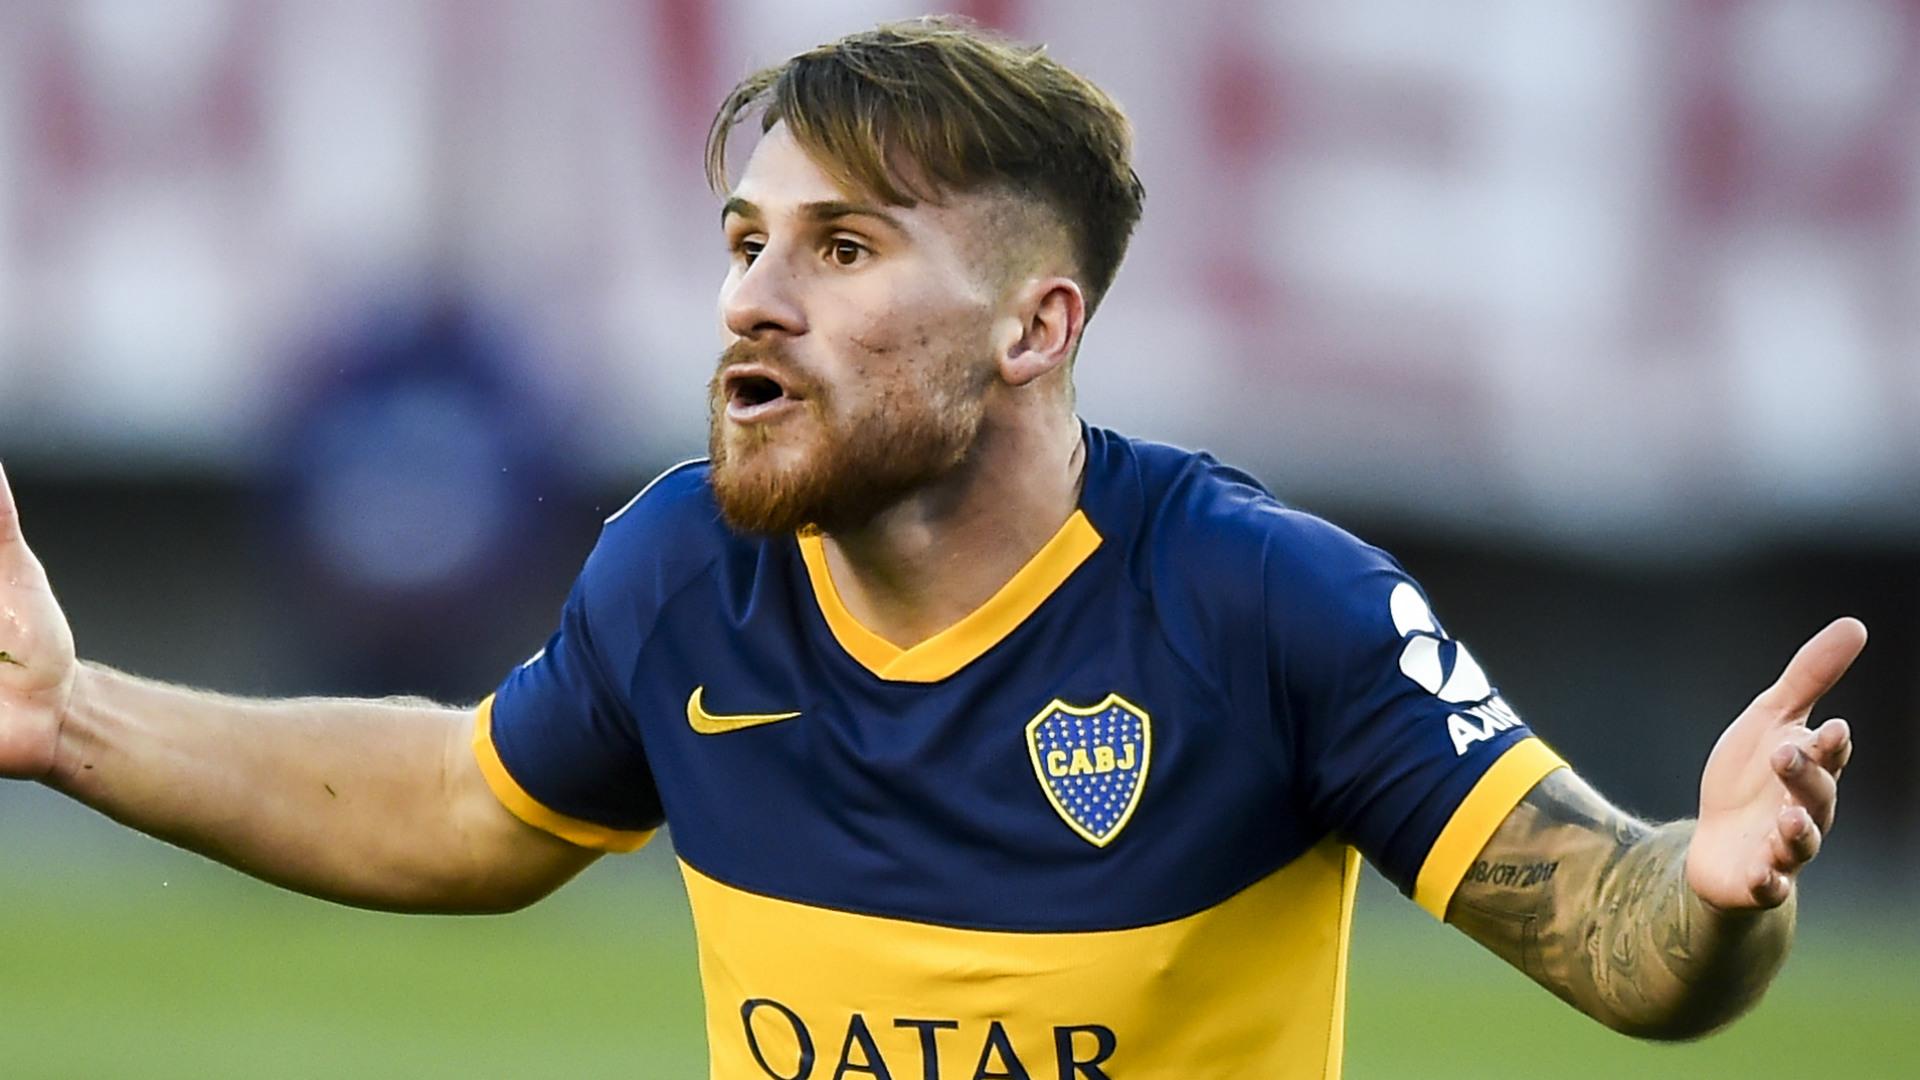 A new Tevez in Brighton? Former Boca star Mac Allister to spearhead bid against drop